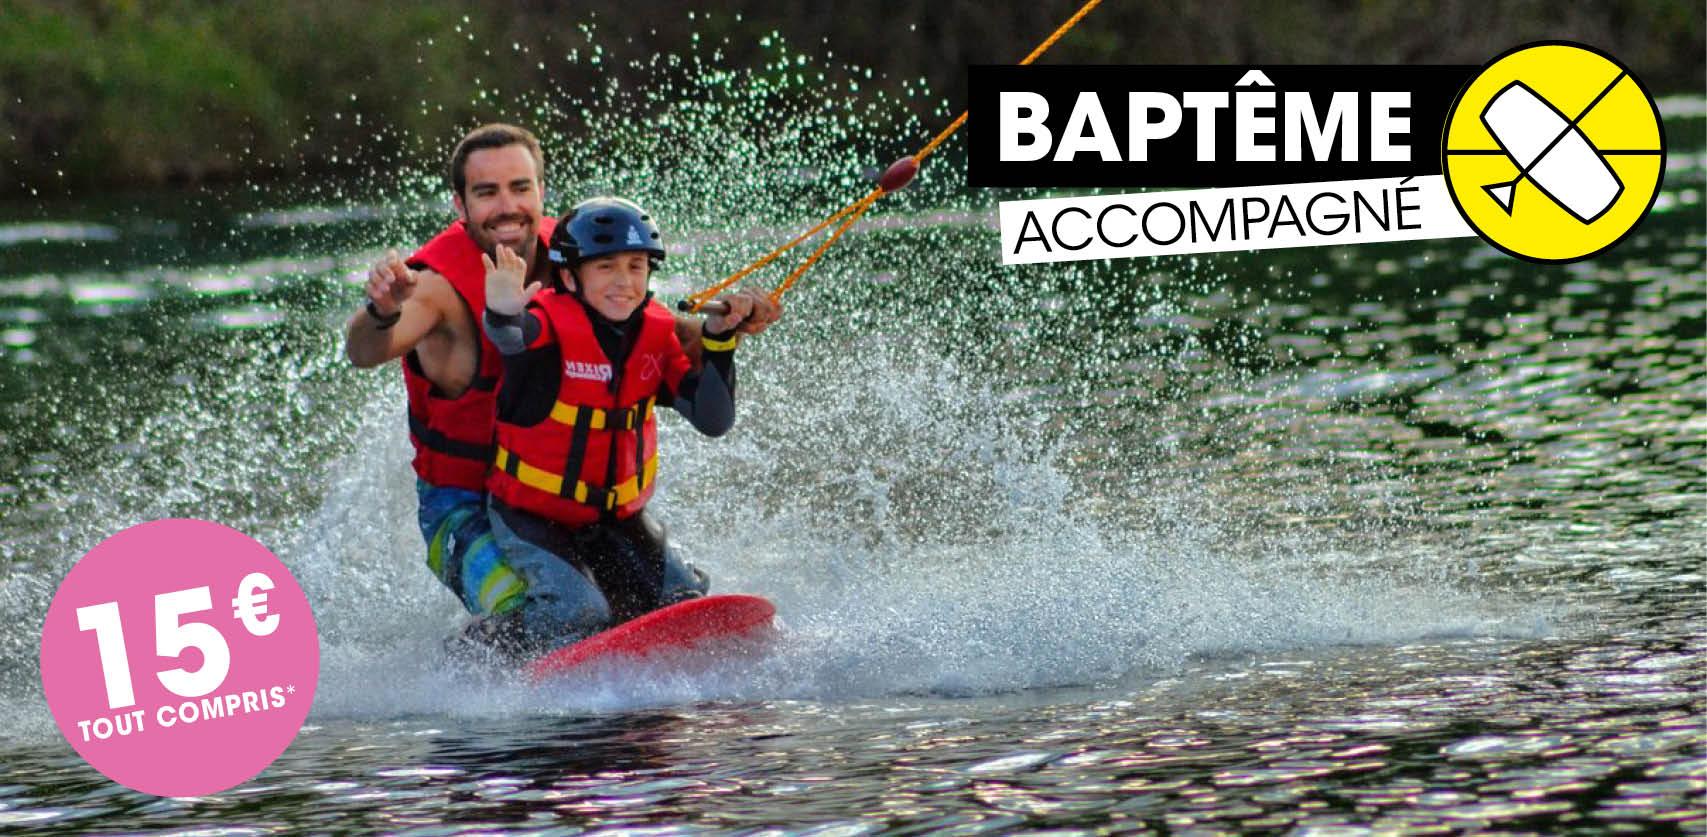 Baptême de wakeboard accompagné